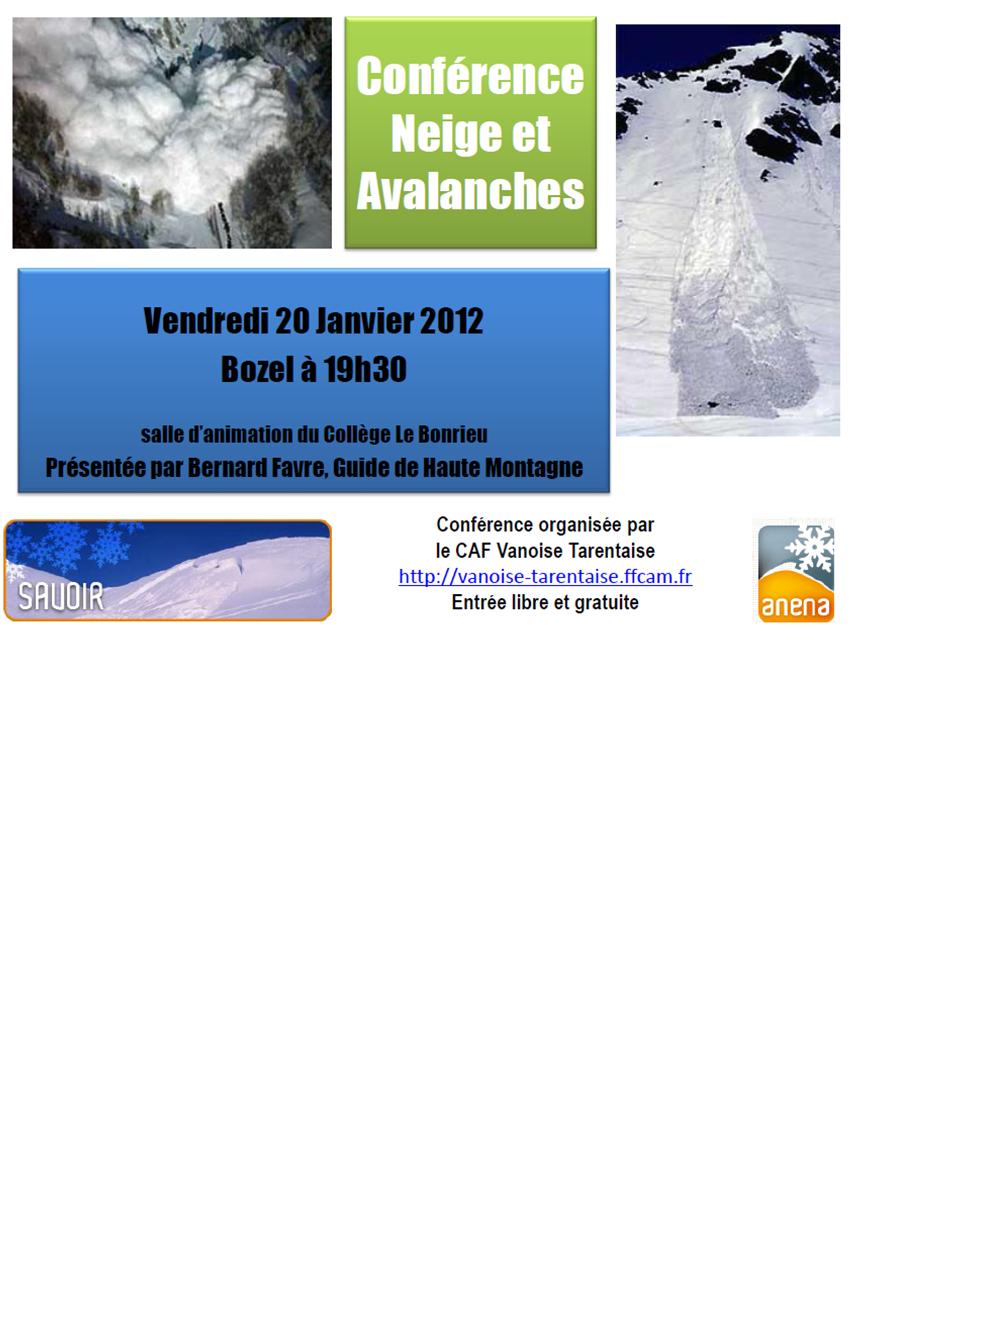 Conférence Neige et Avalanches